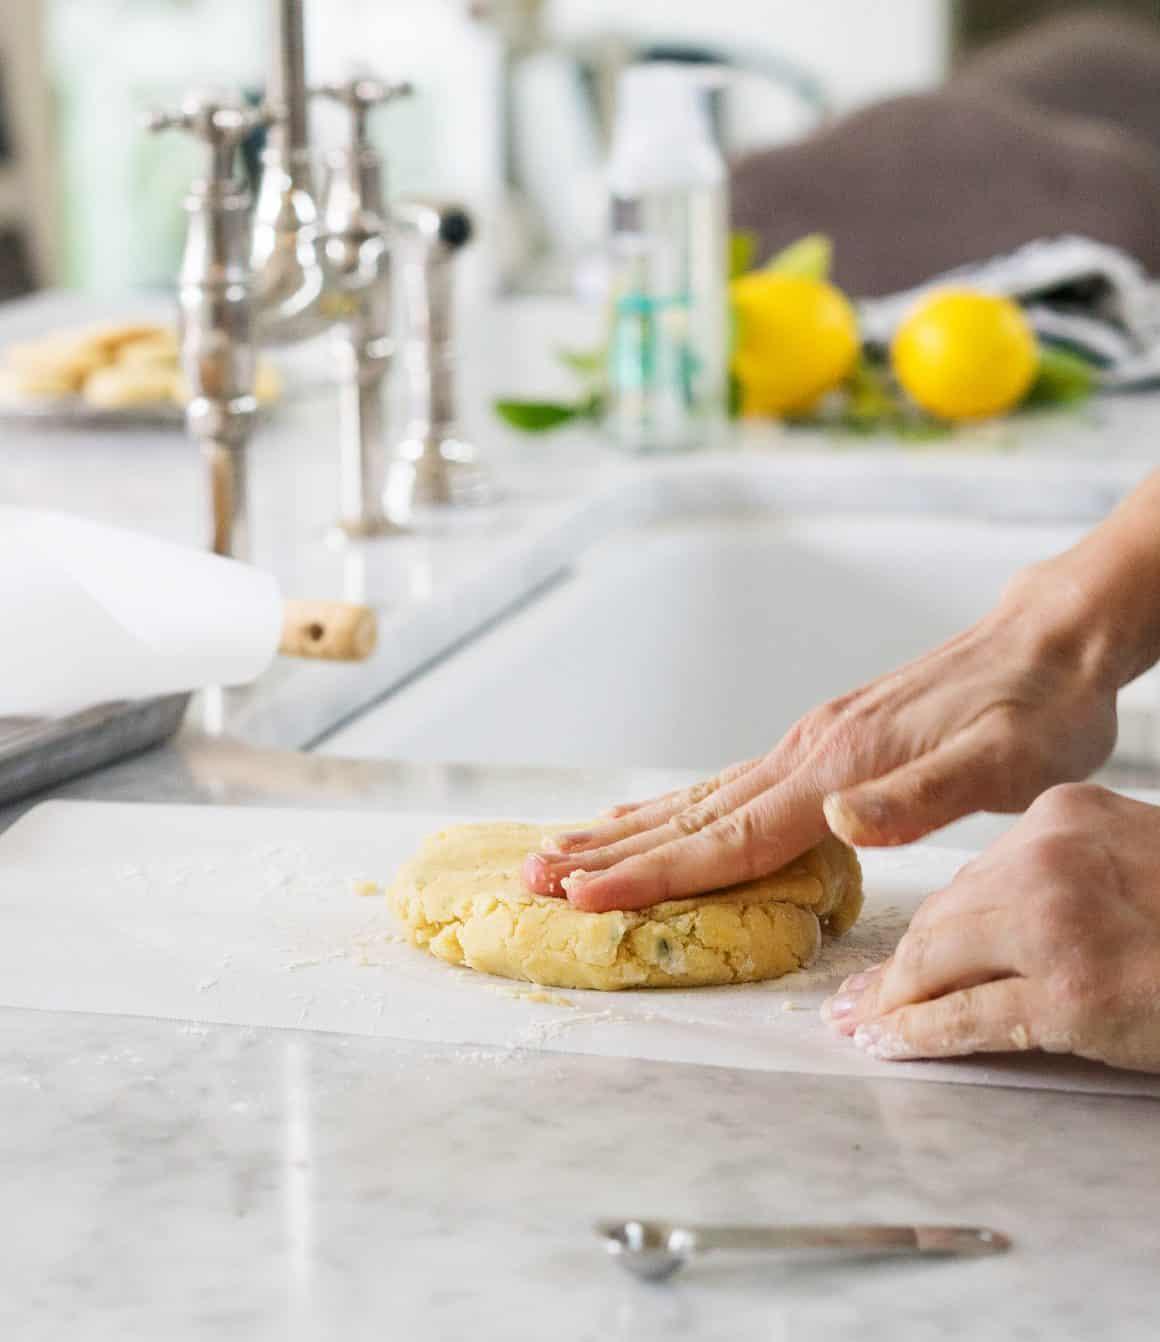 Lemon Thyme Shortbread Cookies Recipe - Love and Lemons